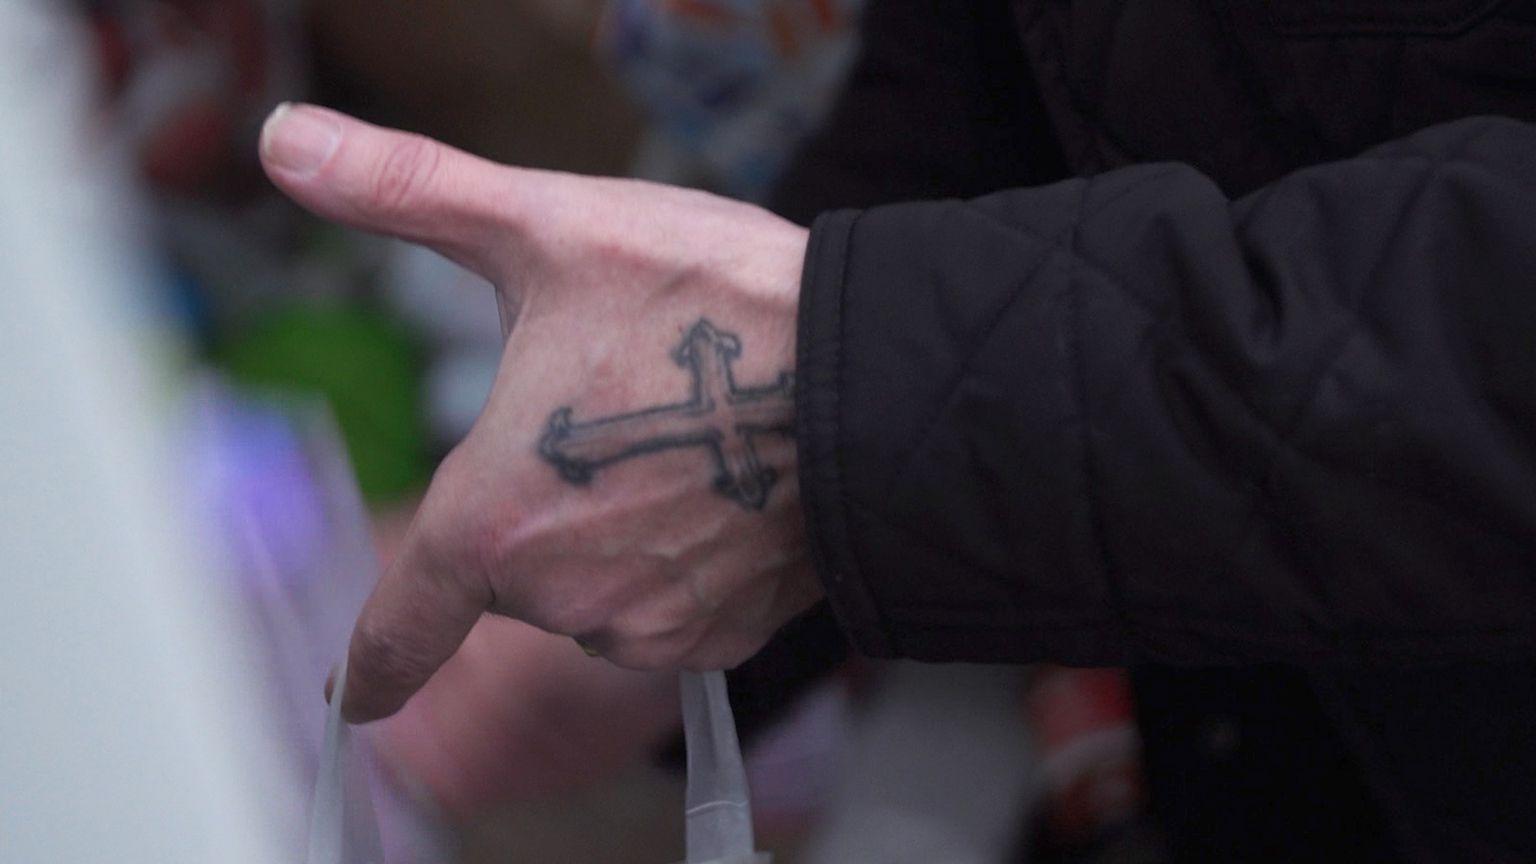 Pastor Mick Fleming's cross tattoo